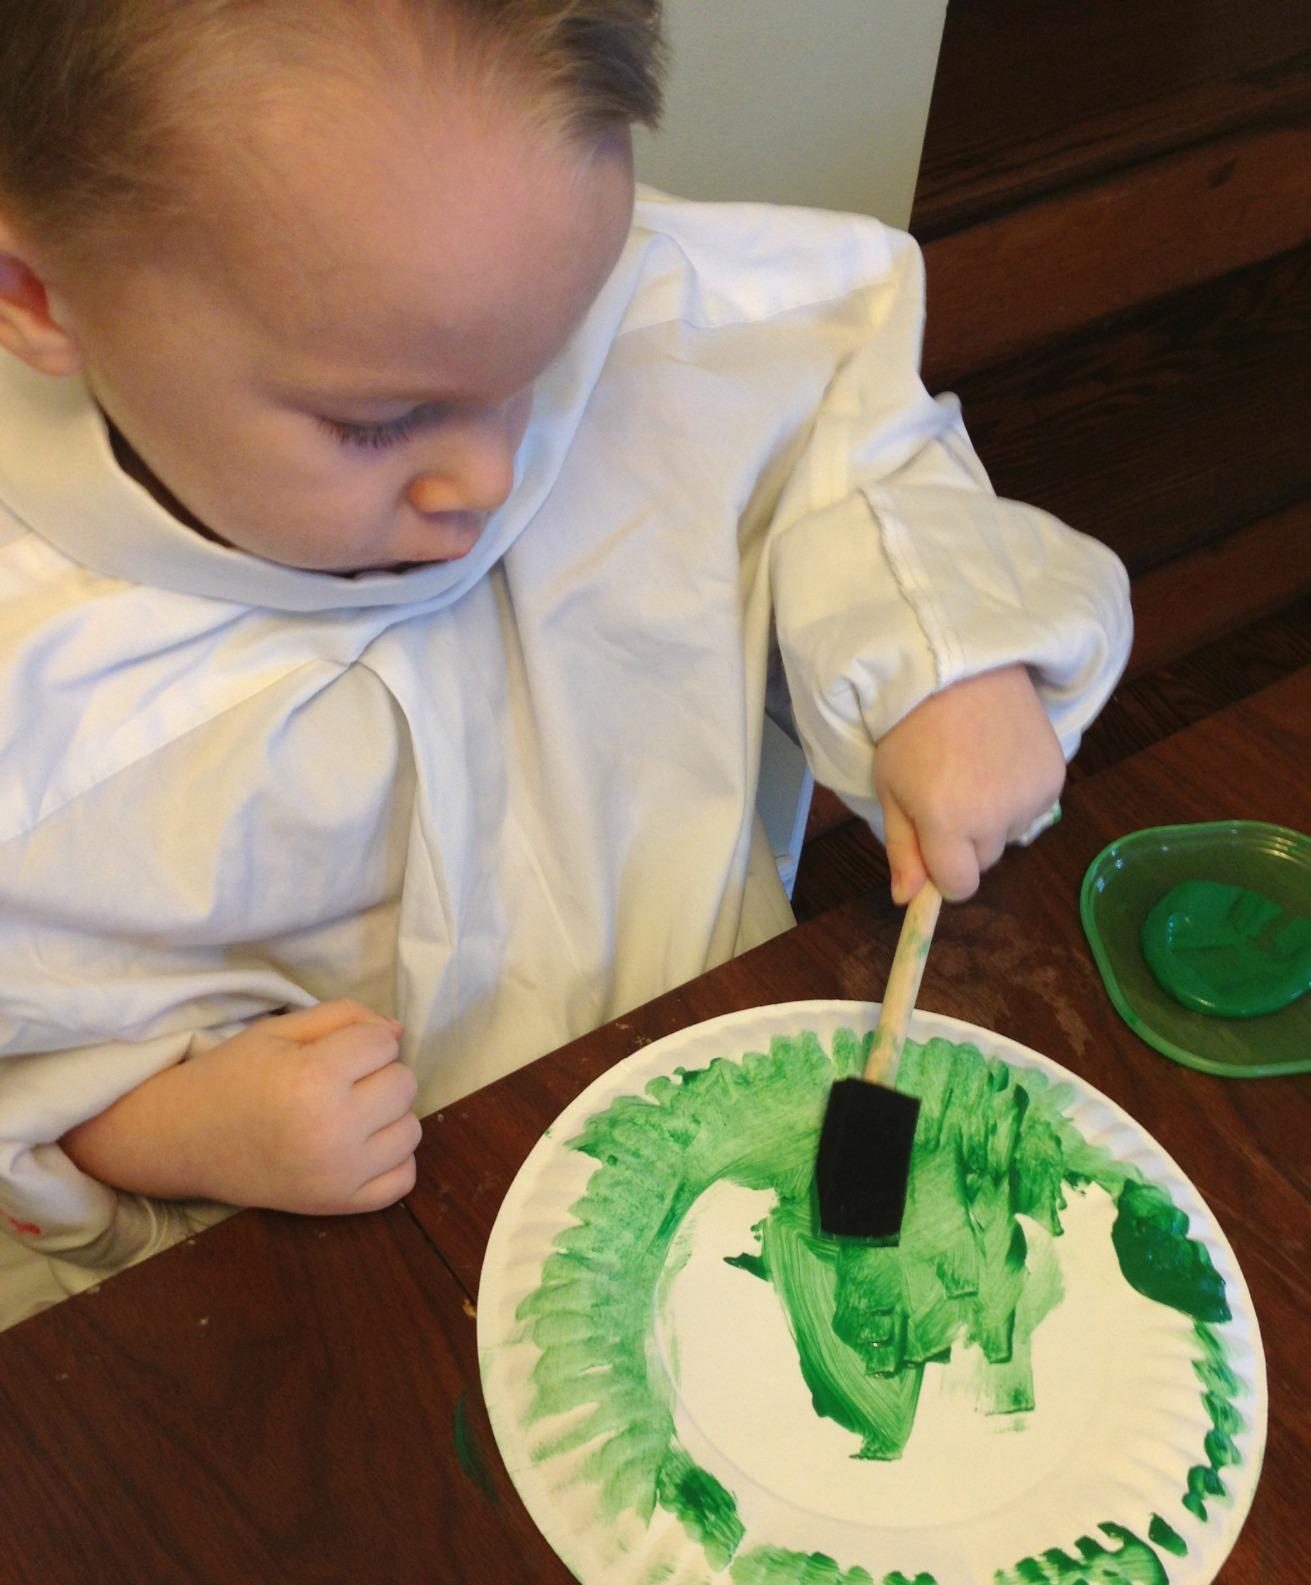 Shamrock_Hat_Painting_Plate